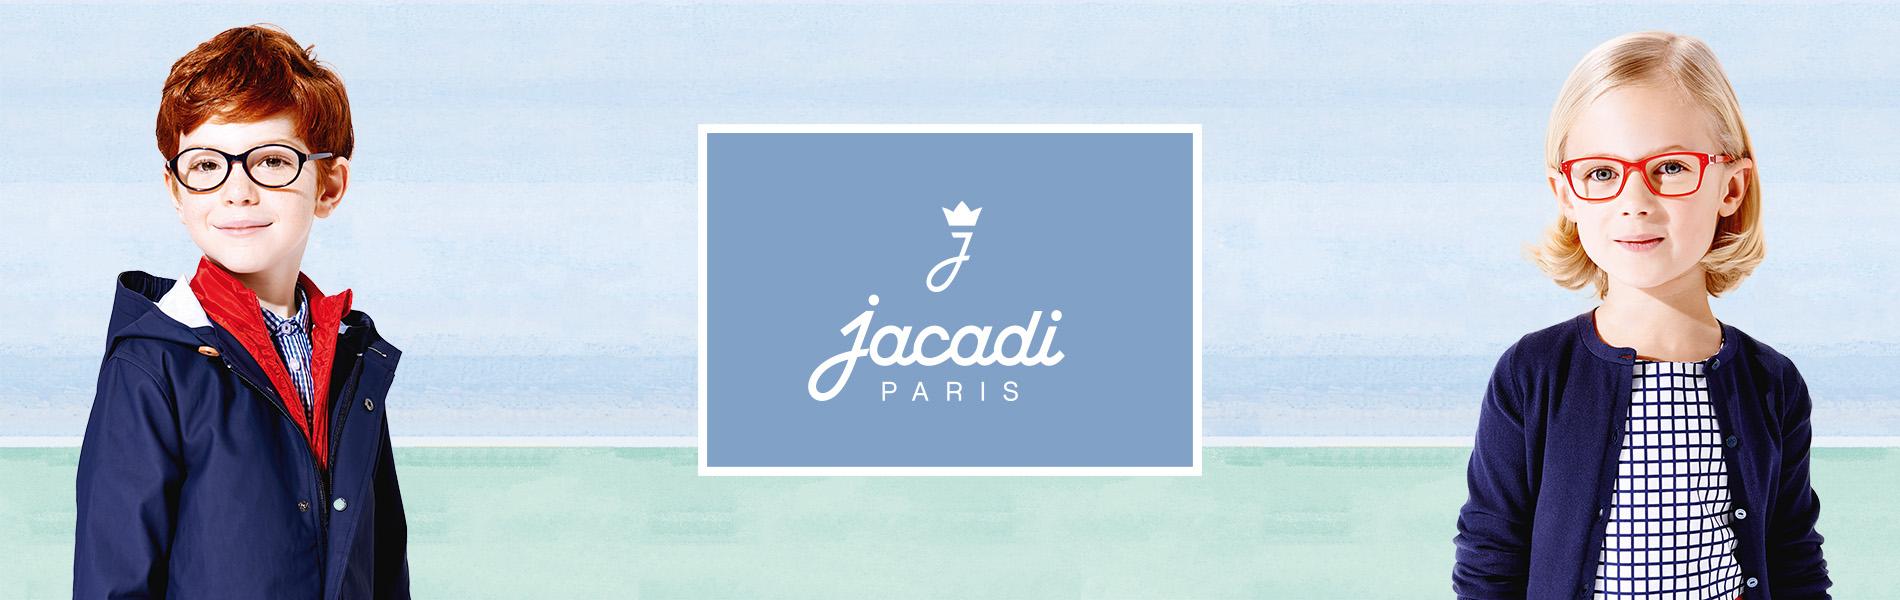 Nieuwe kindercollectie: Jacadi!